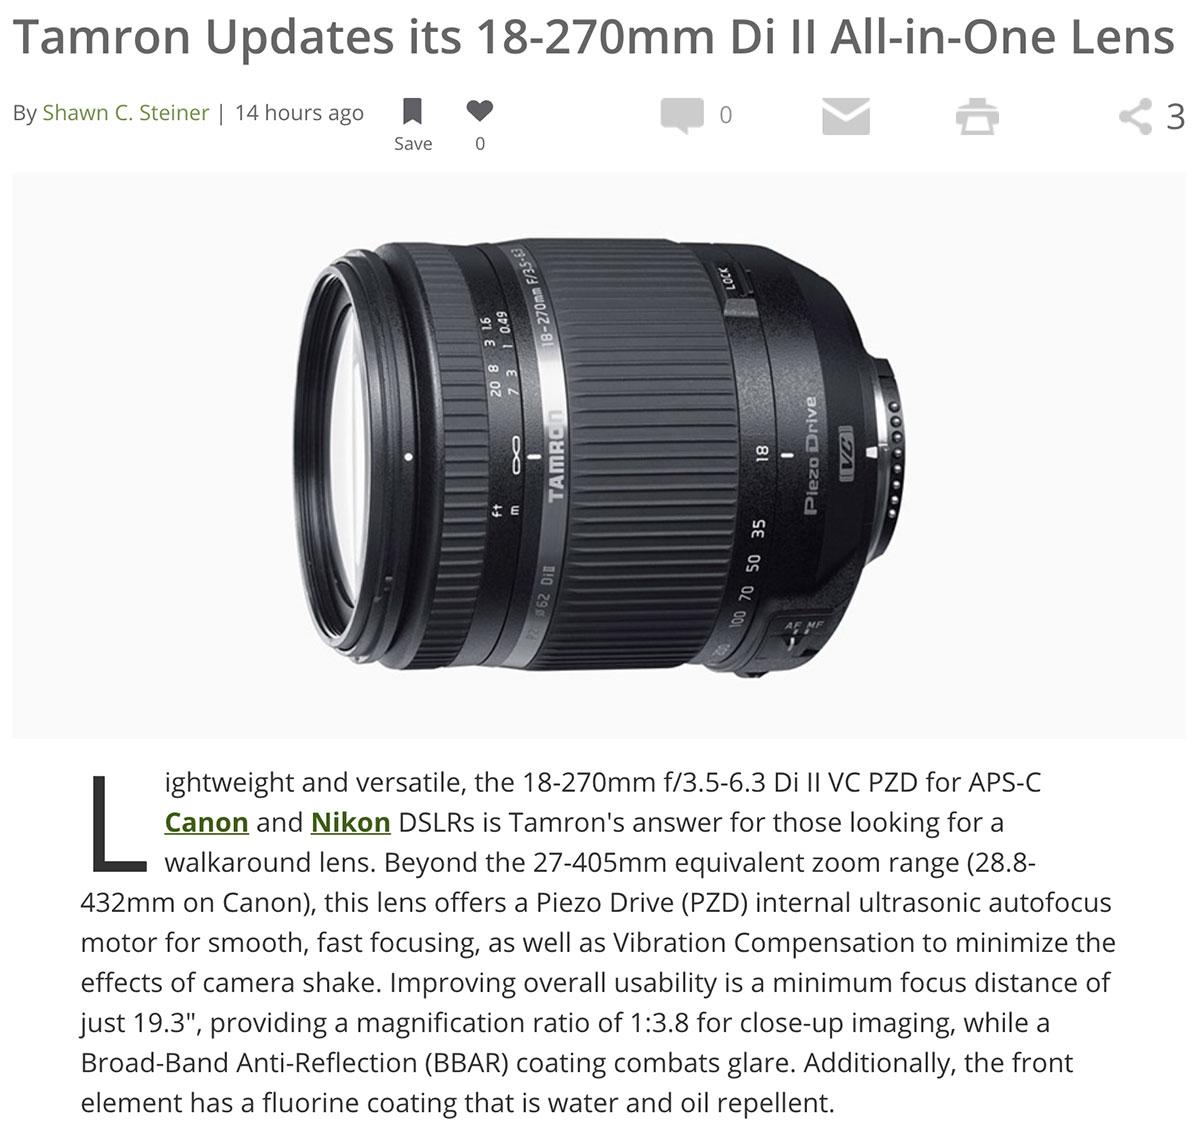 Tamron updates its 18-270mm f/3.5-6.3 Di II VC PZD lens - Photo Rumors